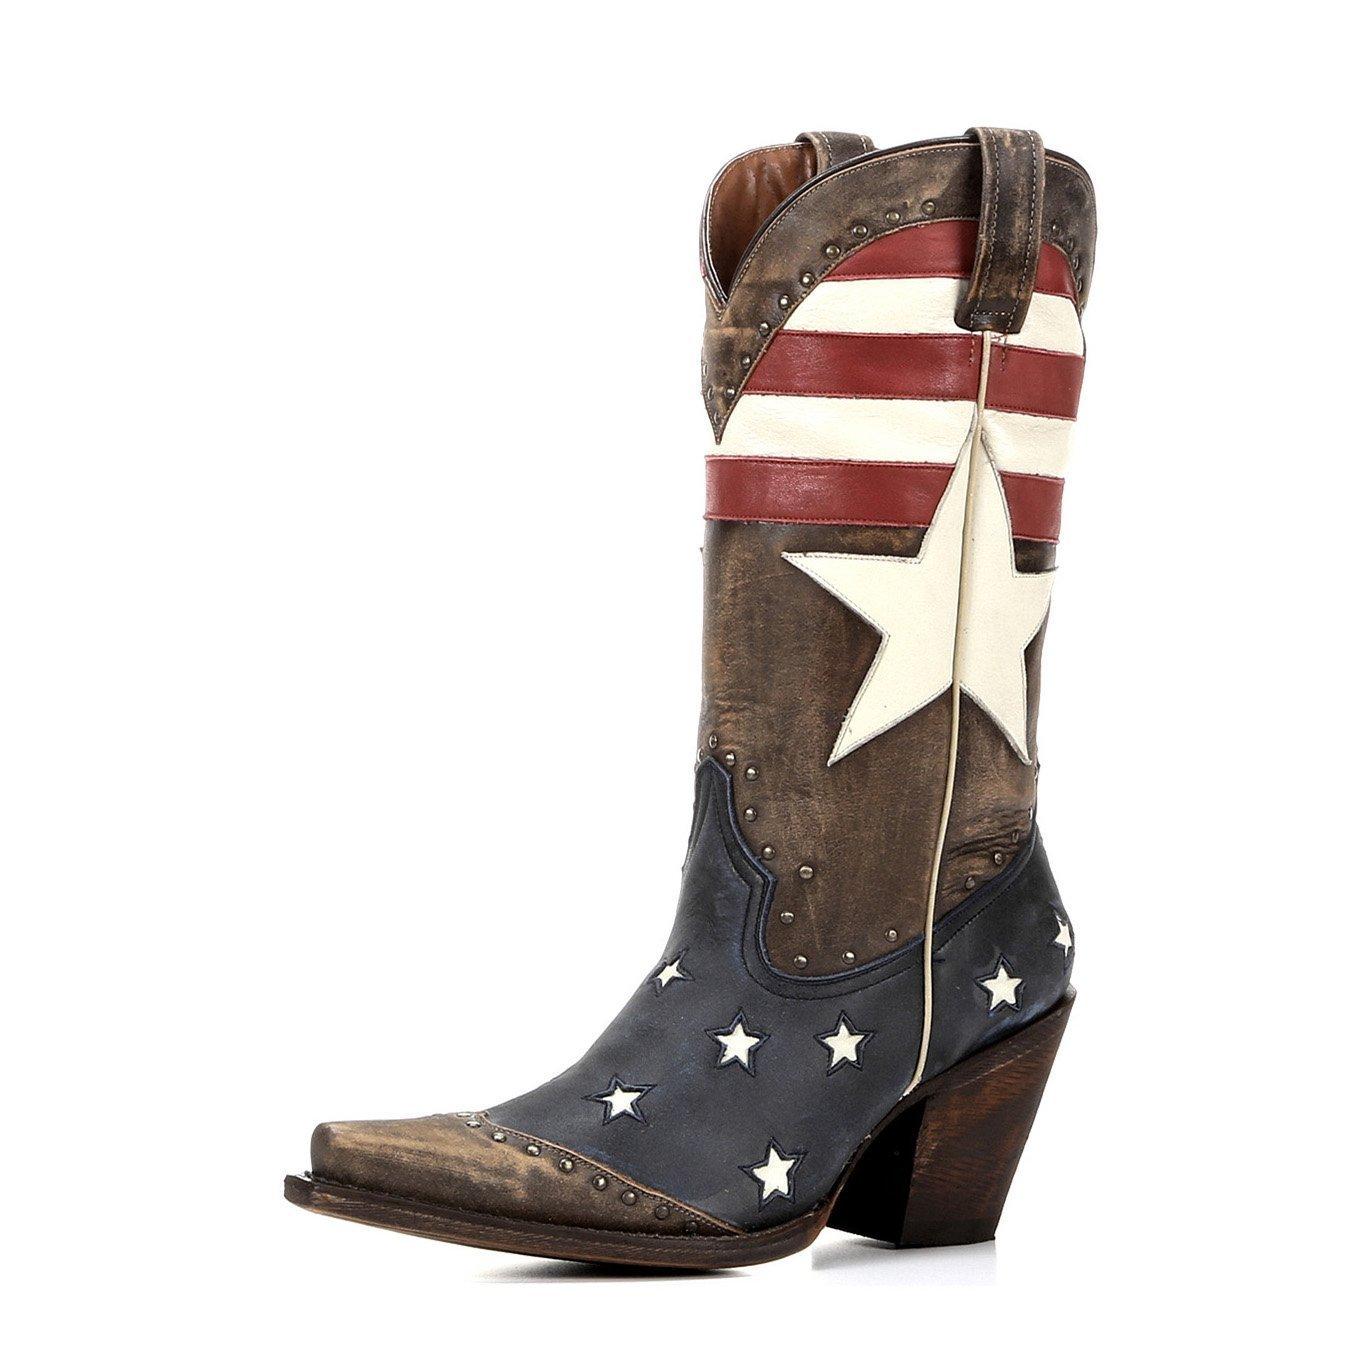 Redneck Riviera Women's Freedom Boot - Vintage Cinnamon B07CTSVW4R 10 B(M) US